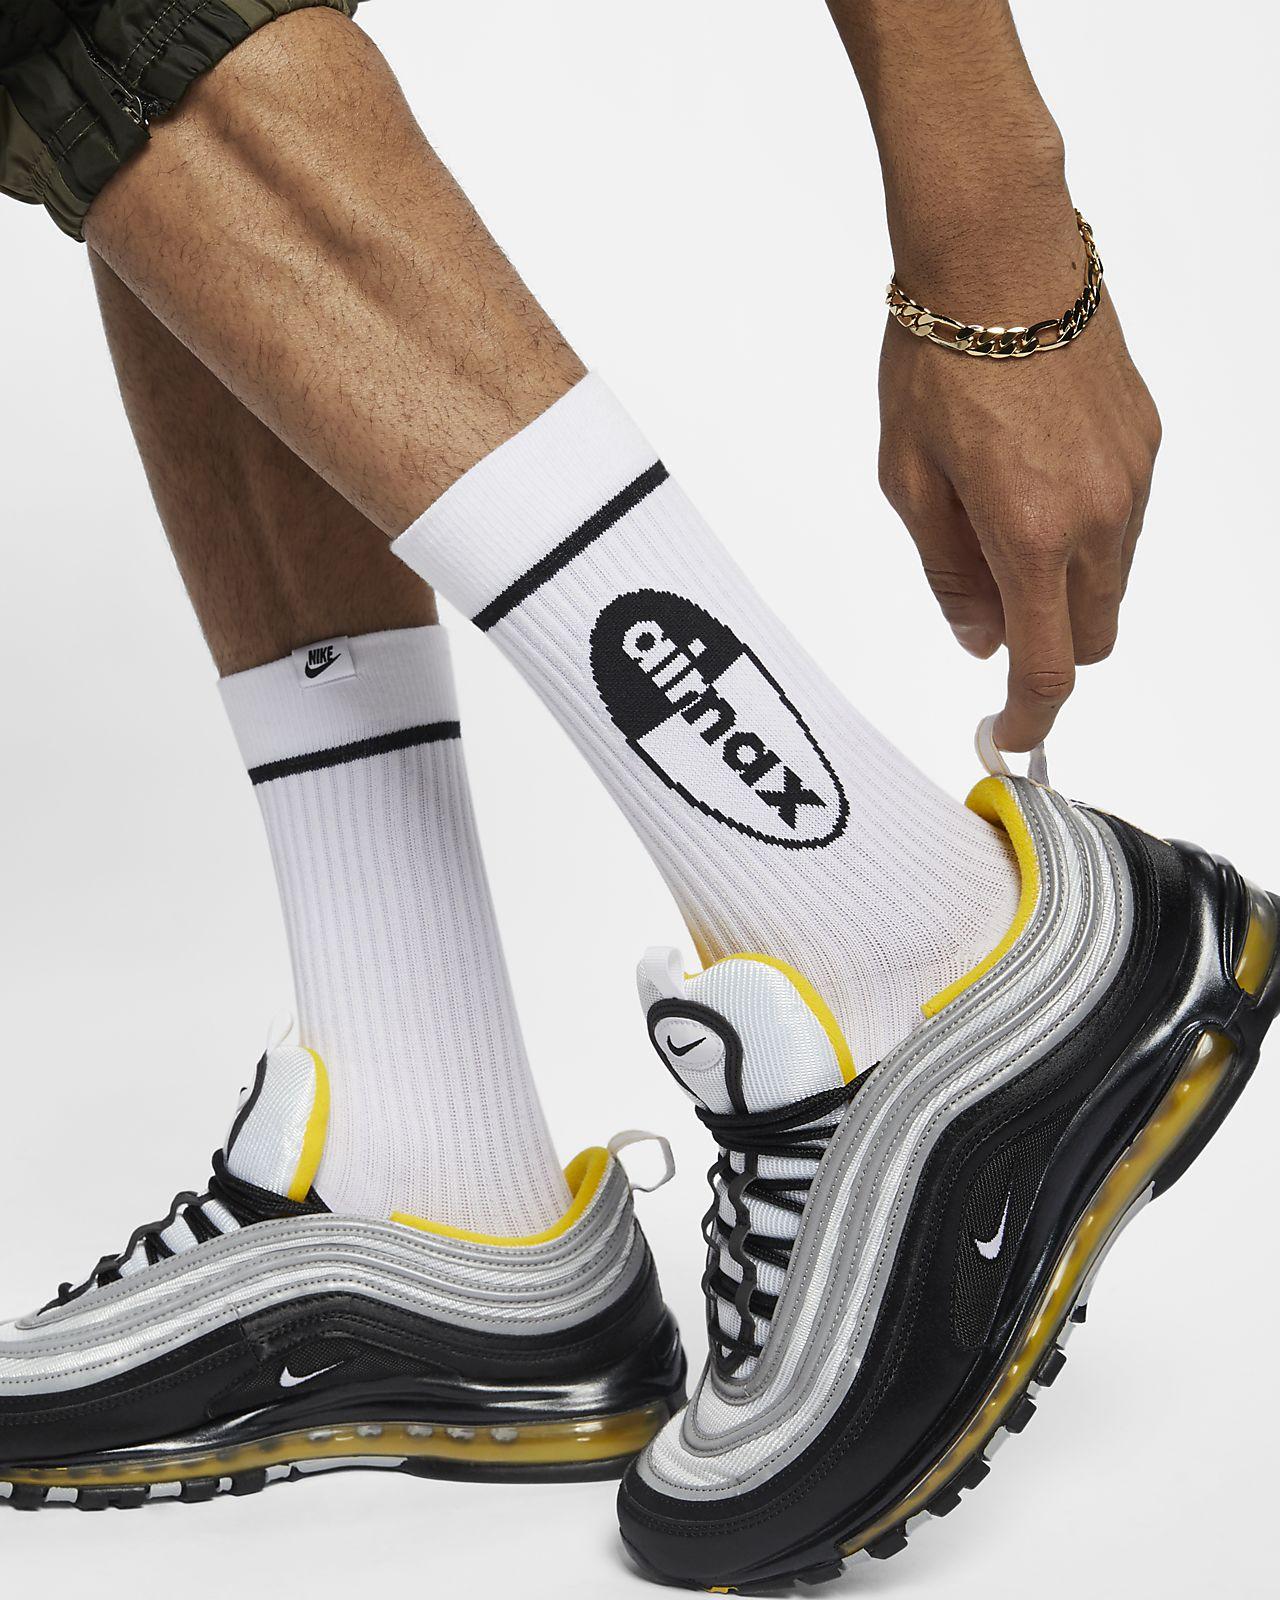 Chaussettes mi-mollet Nike Air Max (2 paires)